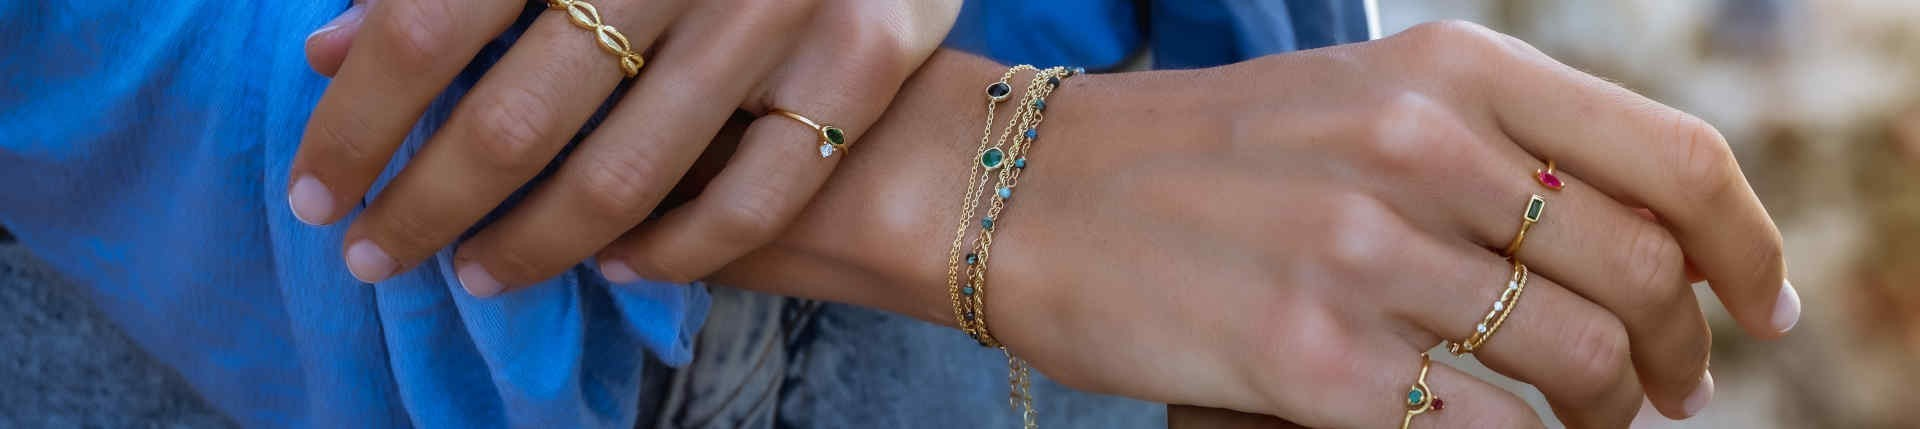 Bracelets in gold